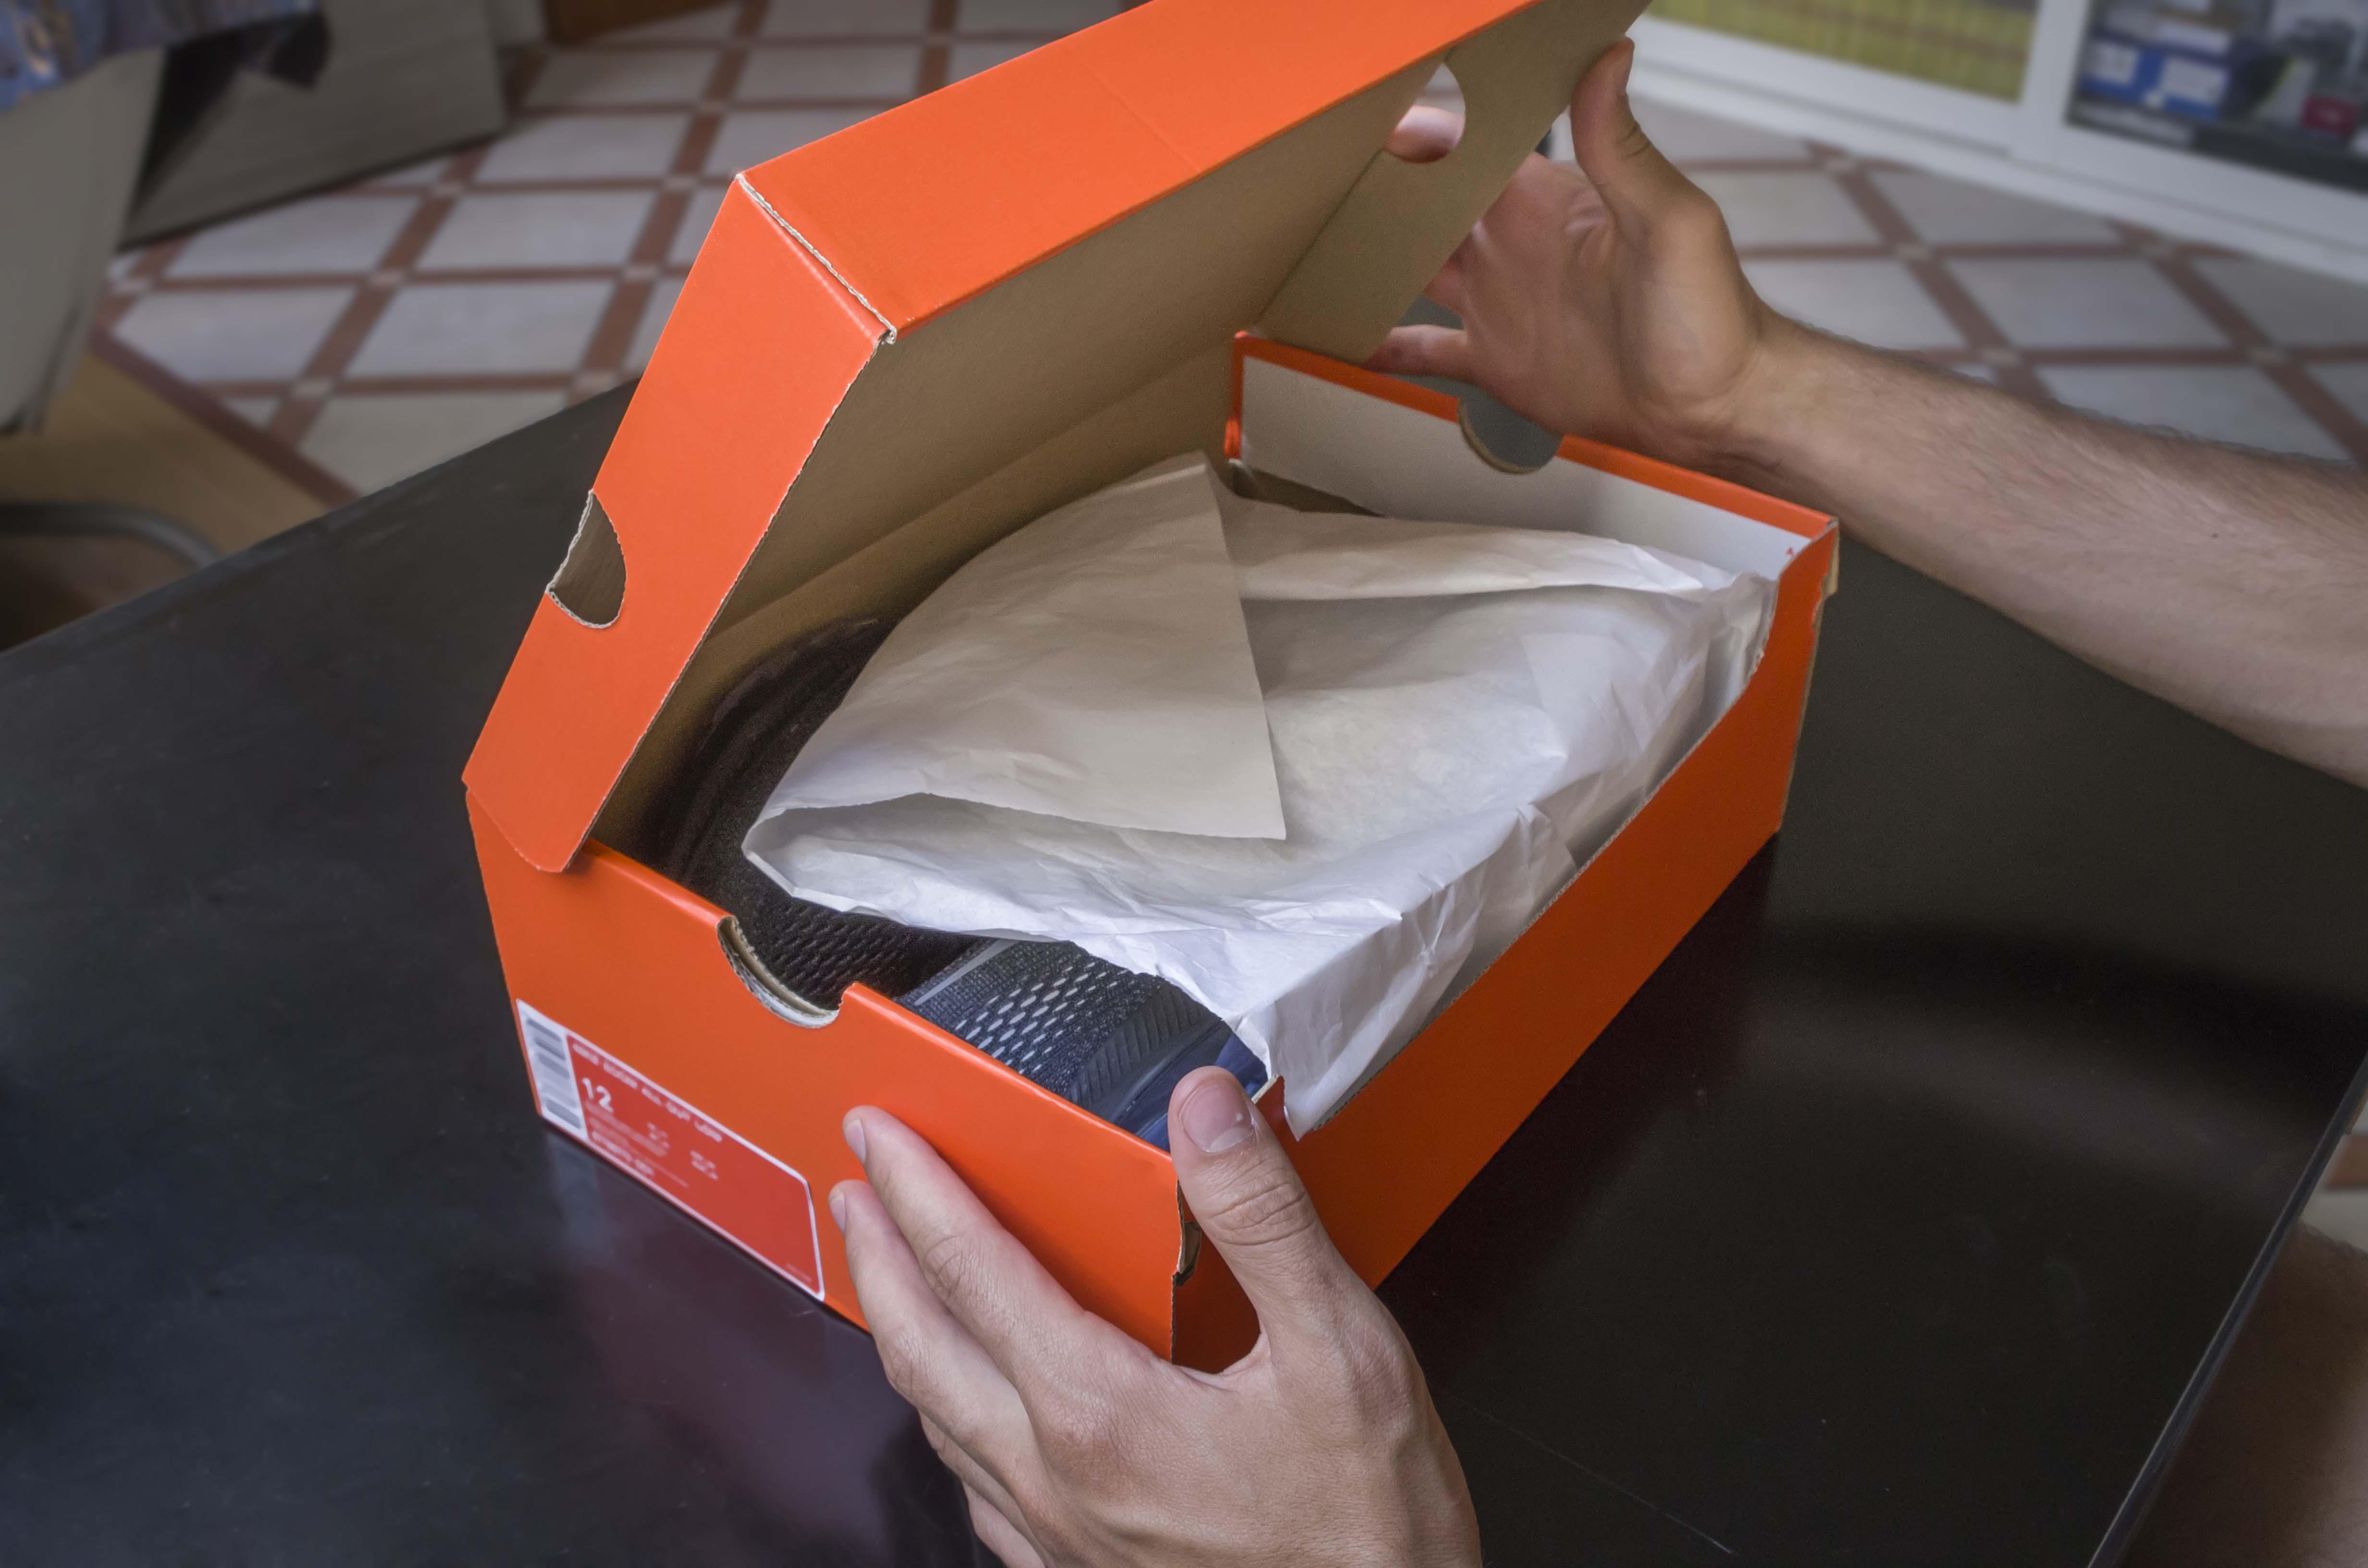 online-csomagatvetel-1